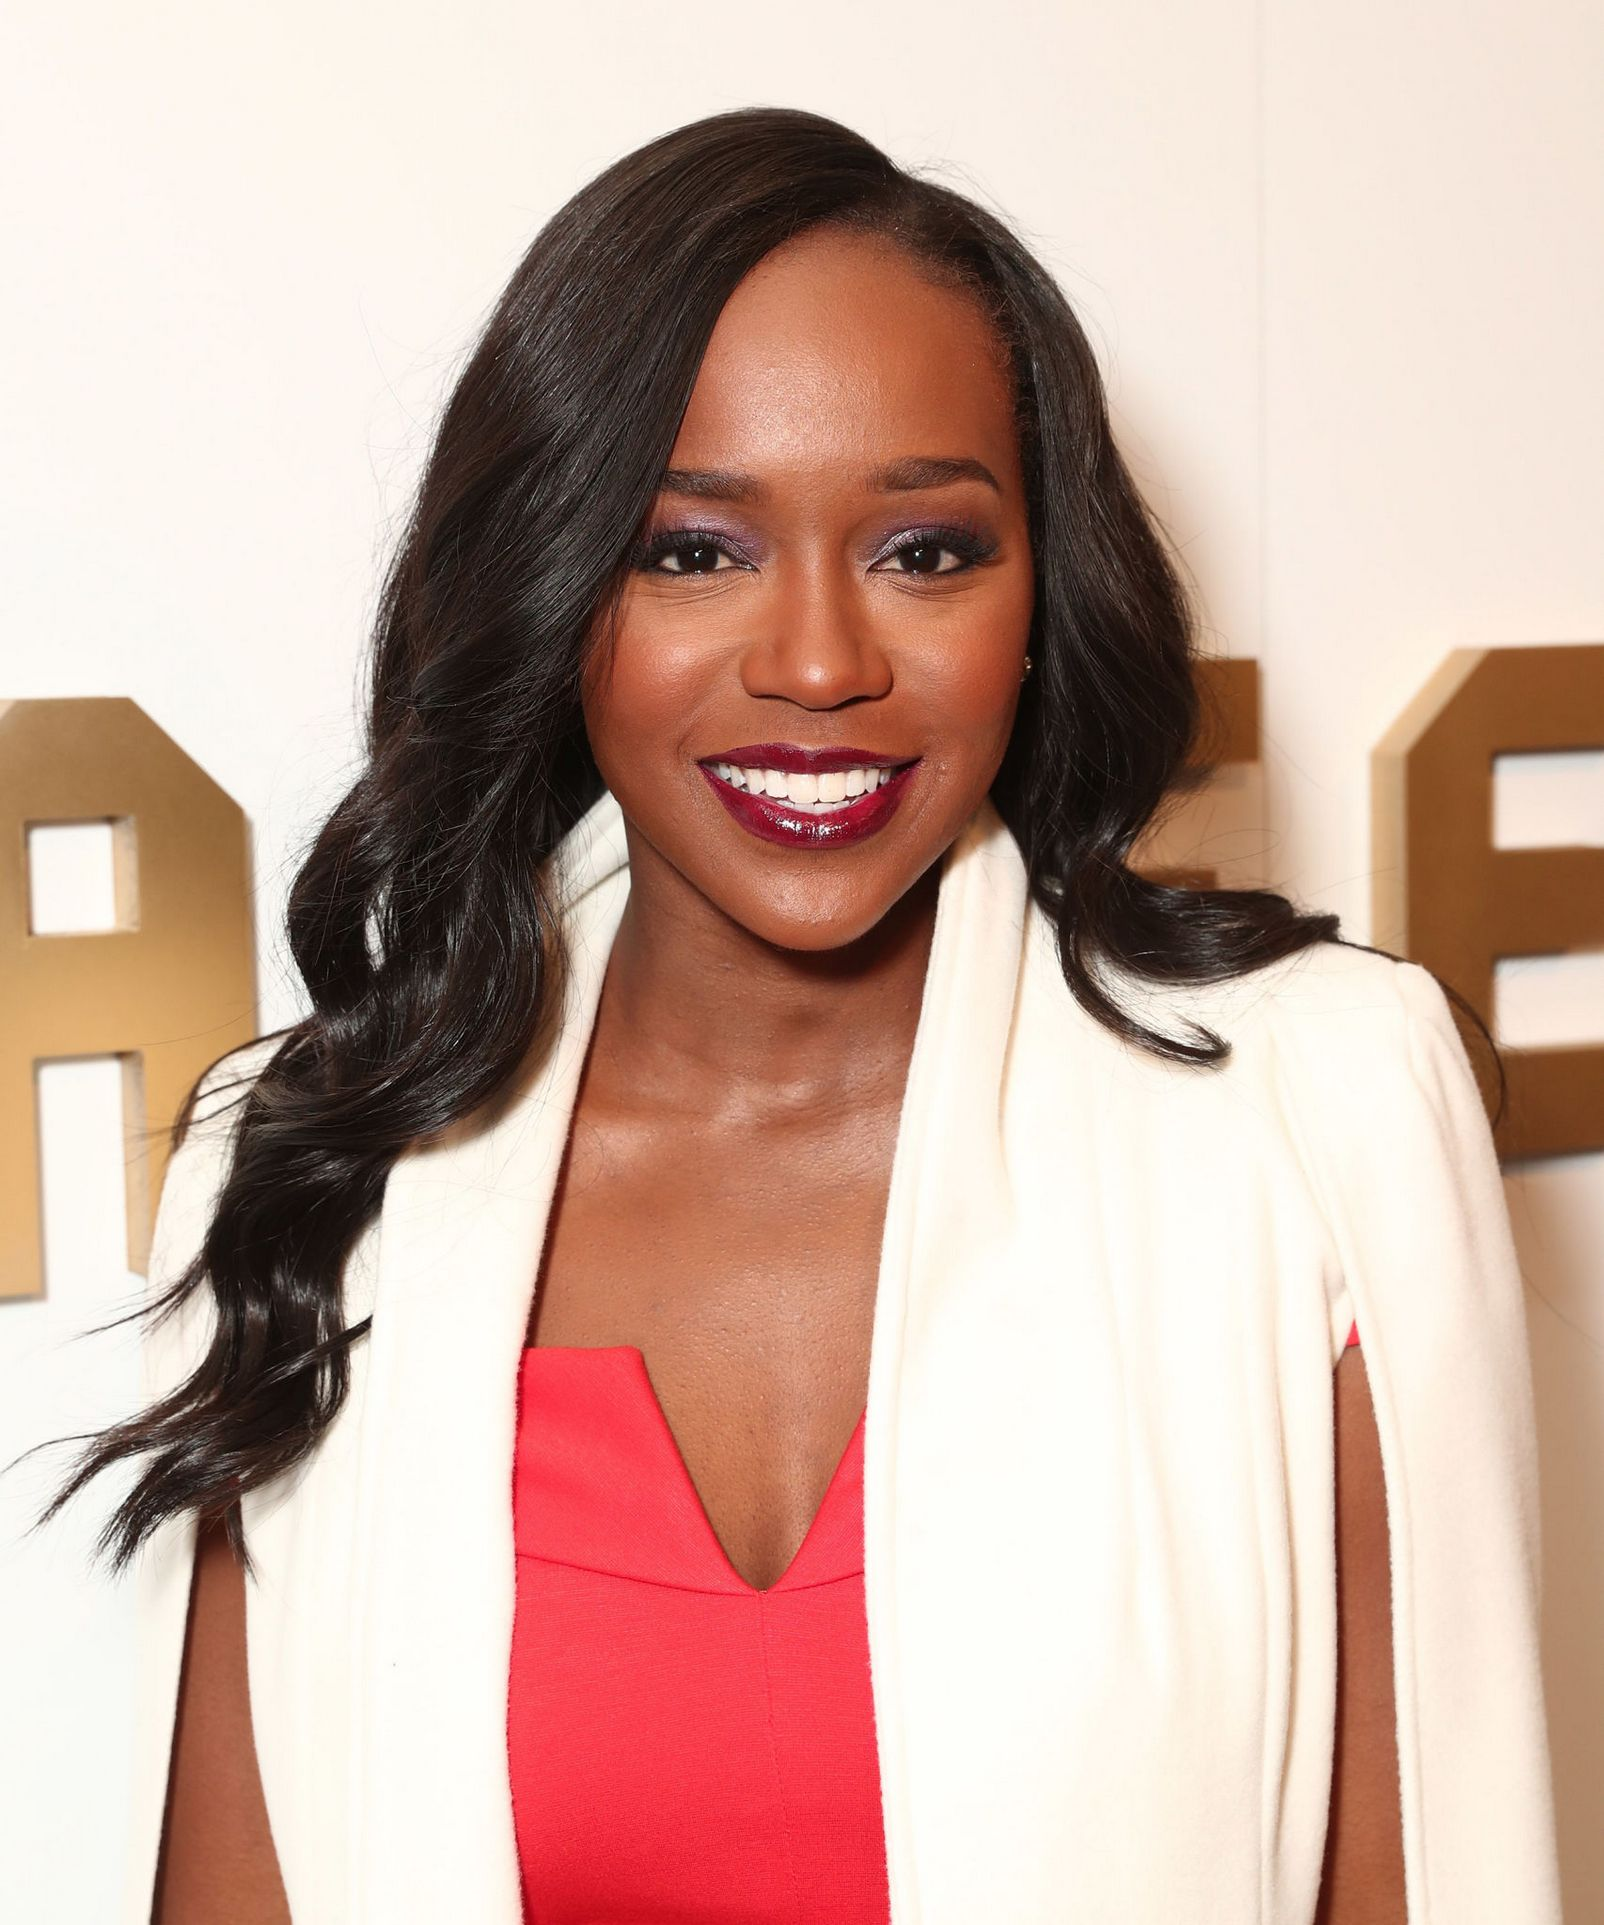 Aja Naomi King at the 8th Annual Oscars Sistahs Soiree